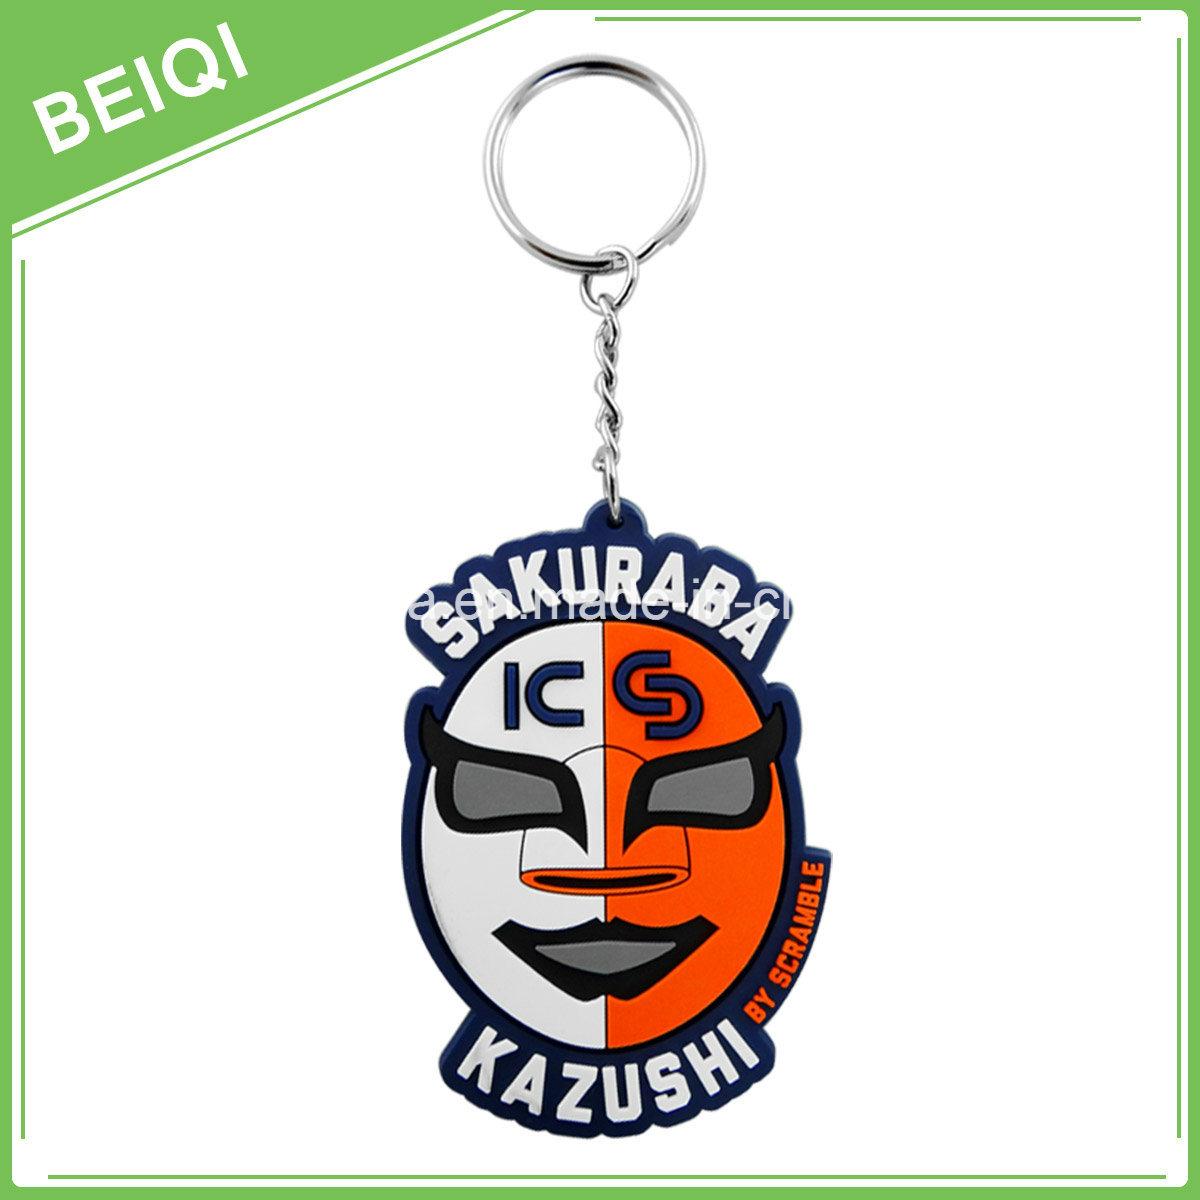 3D PVC Keychain, Custom Soft PVC Keychains, Soft PVC Rubber Keychain